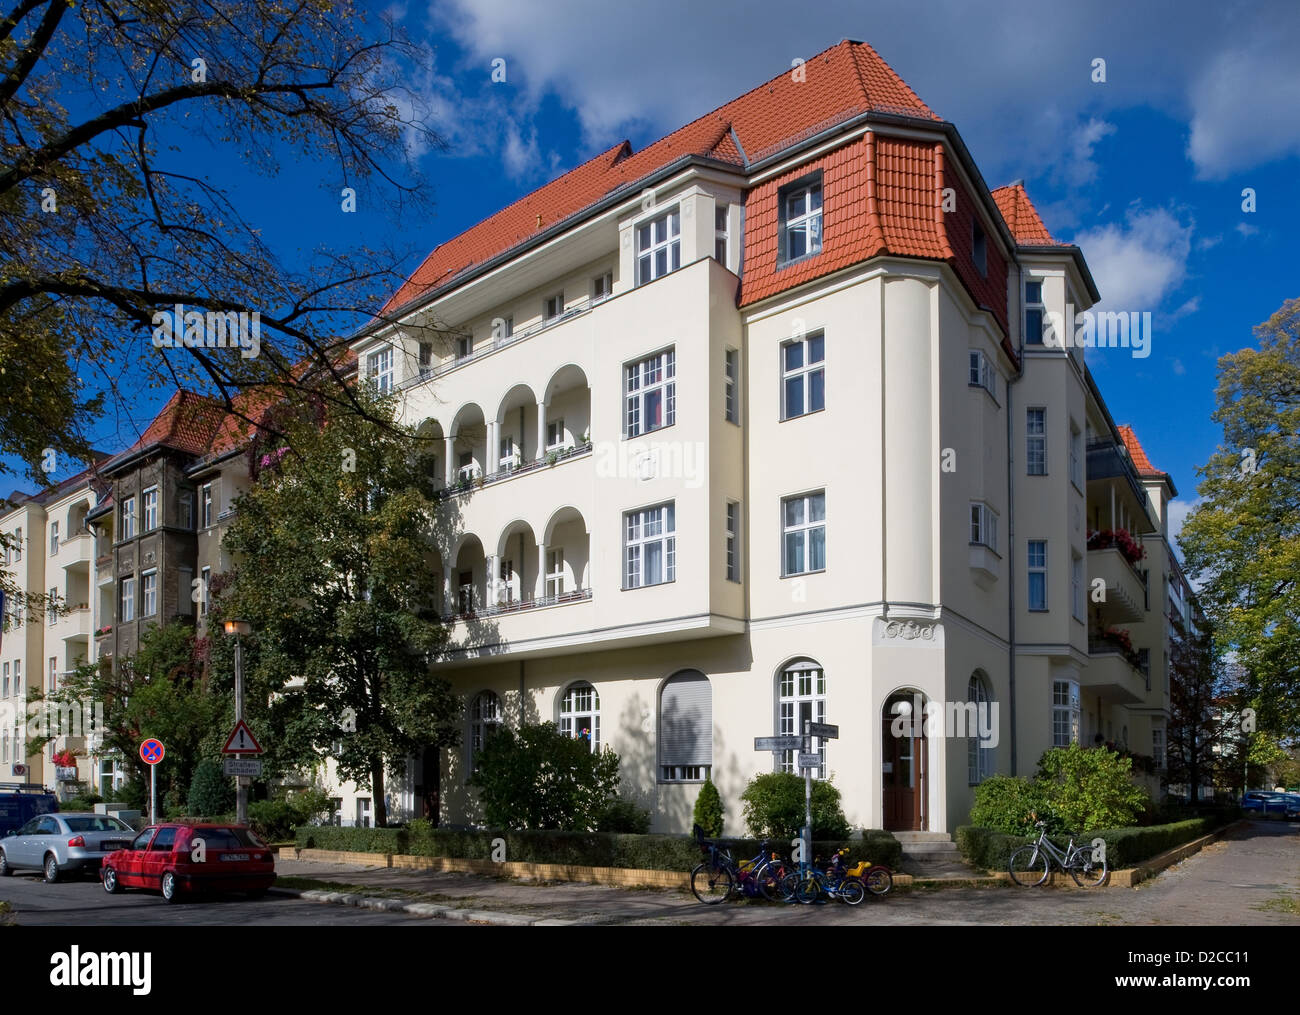 berlin germany renovated old buildings in berlin pankow. Black Bedroom Furniture Sets. Home Design Ideas